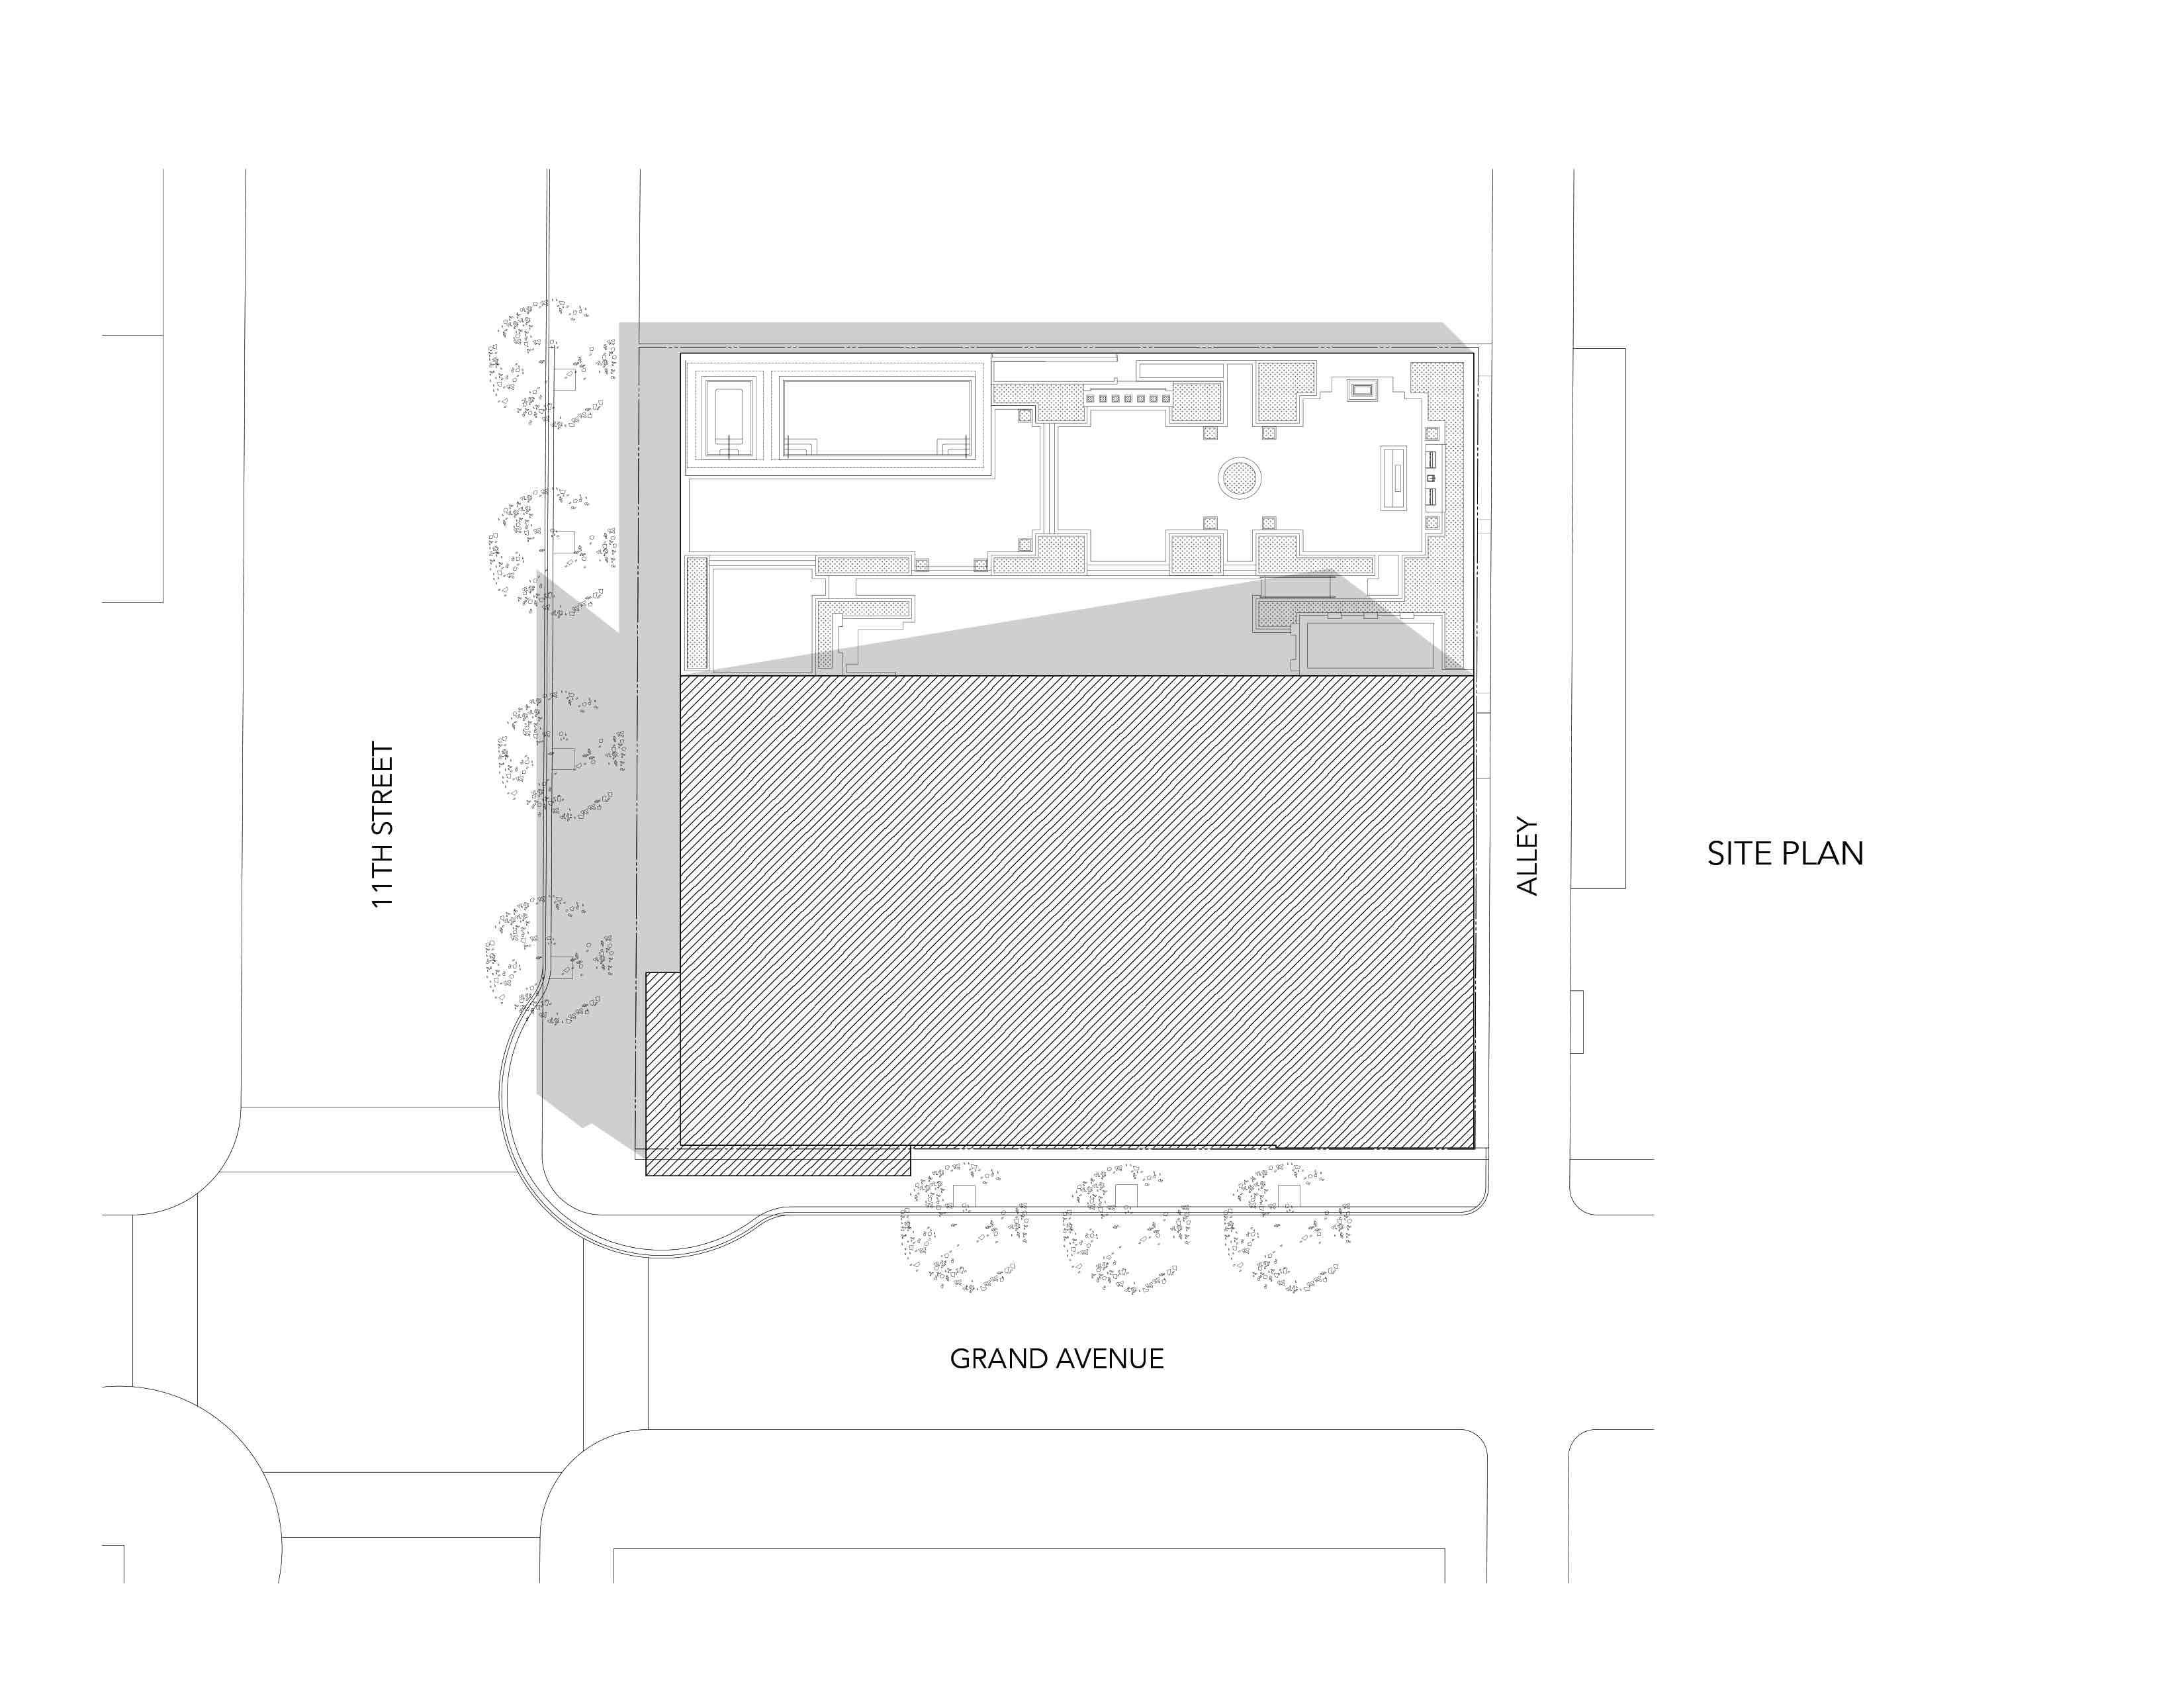 Ten50 Site Plan }